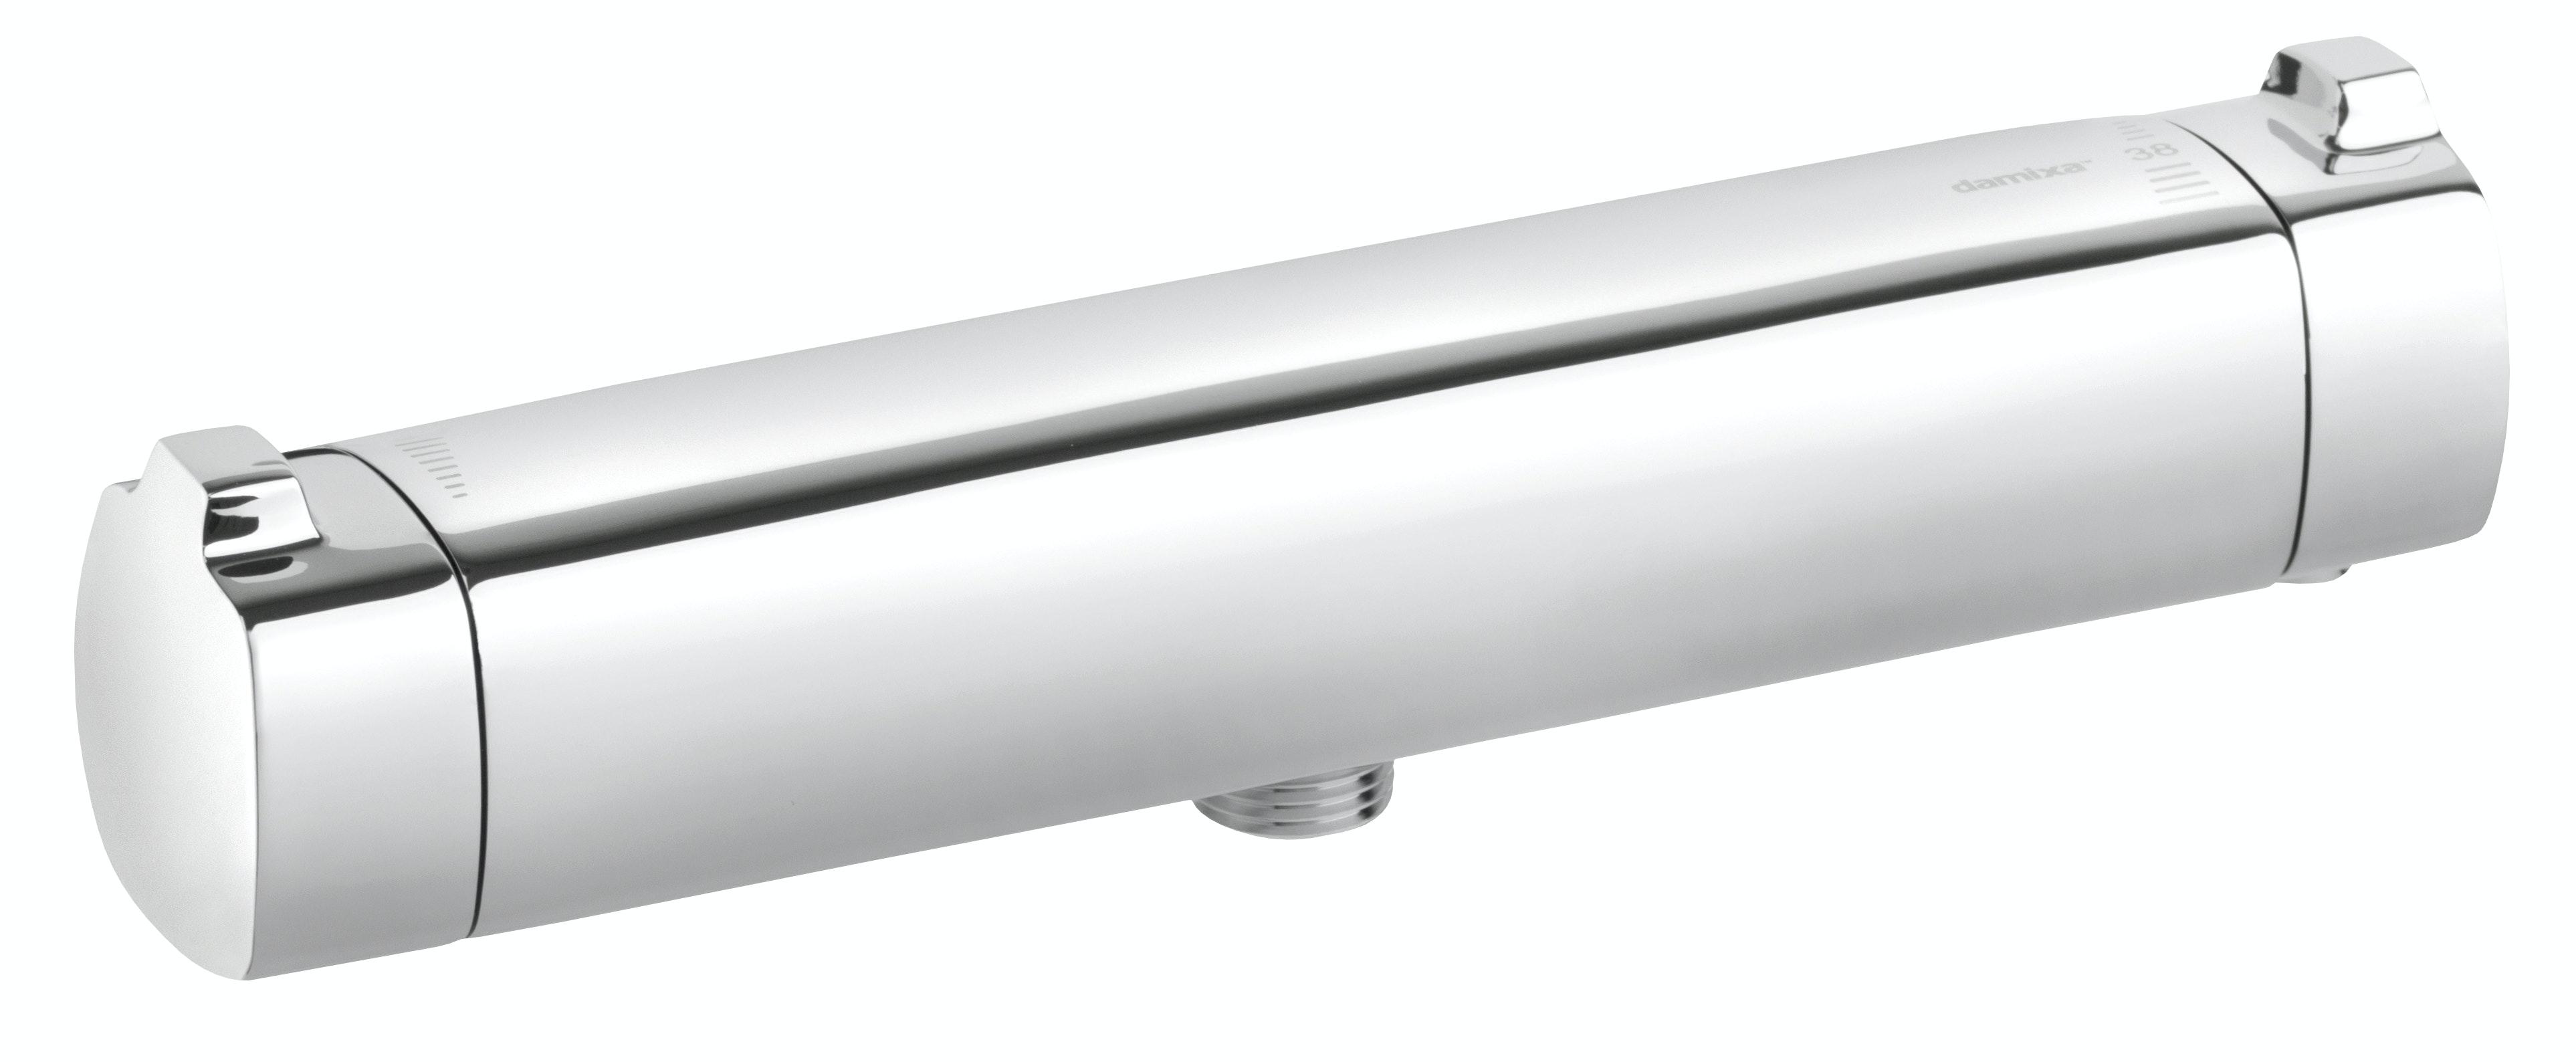 Termostatblandare Damixa Thermixa 700 160CC Krom